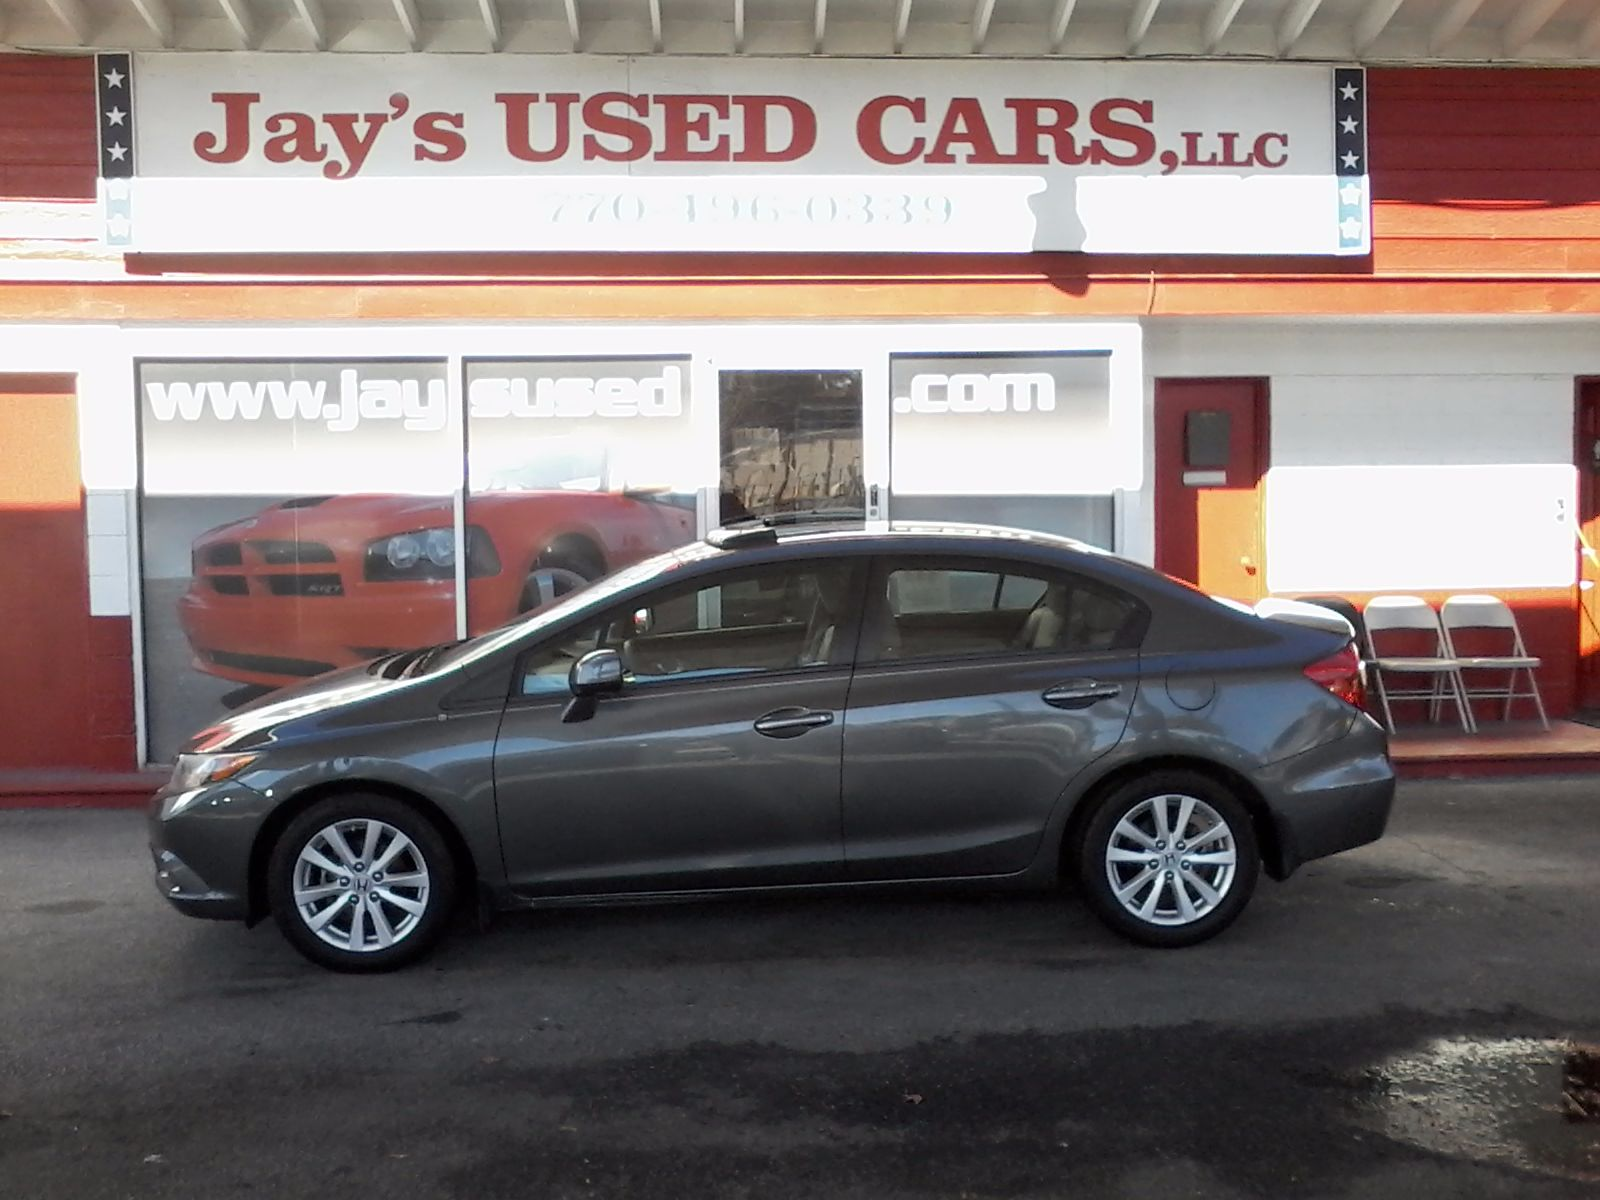 Photos of a Used 2012 Honda Civic Sdn EX at Jay\'s Used Cars LLC